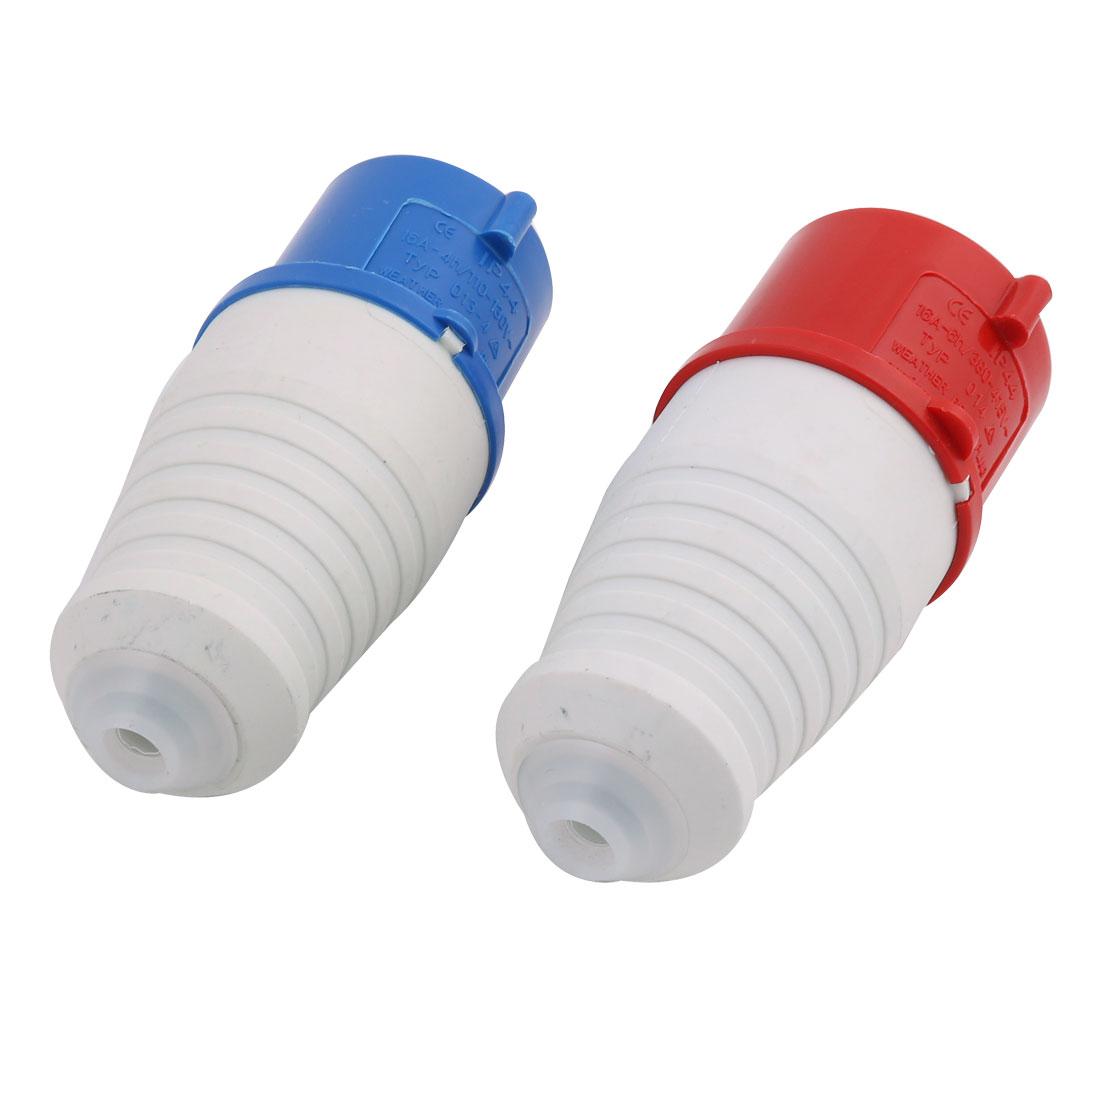 2pcs IEC309-2 3P+E 2P+E IP44 Waterproof Industrial Connector Socket Red Blue